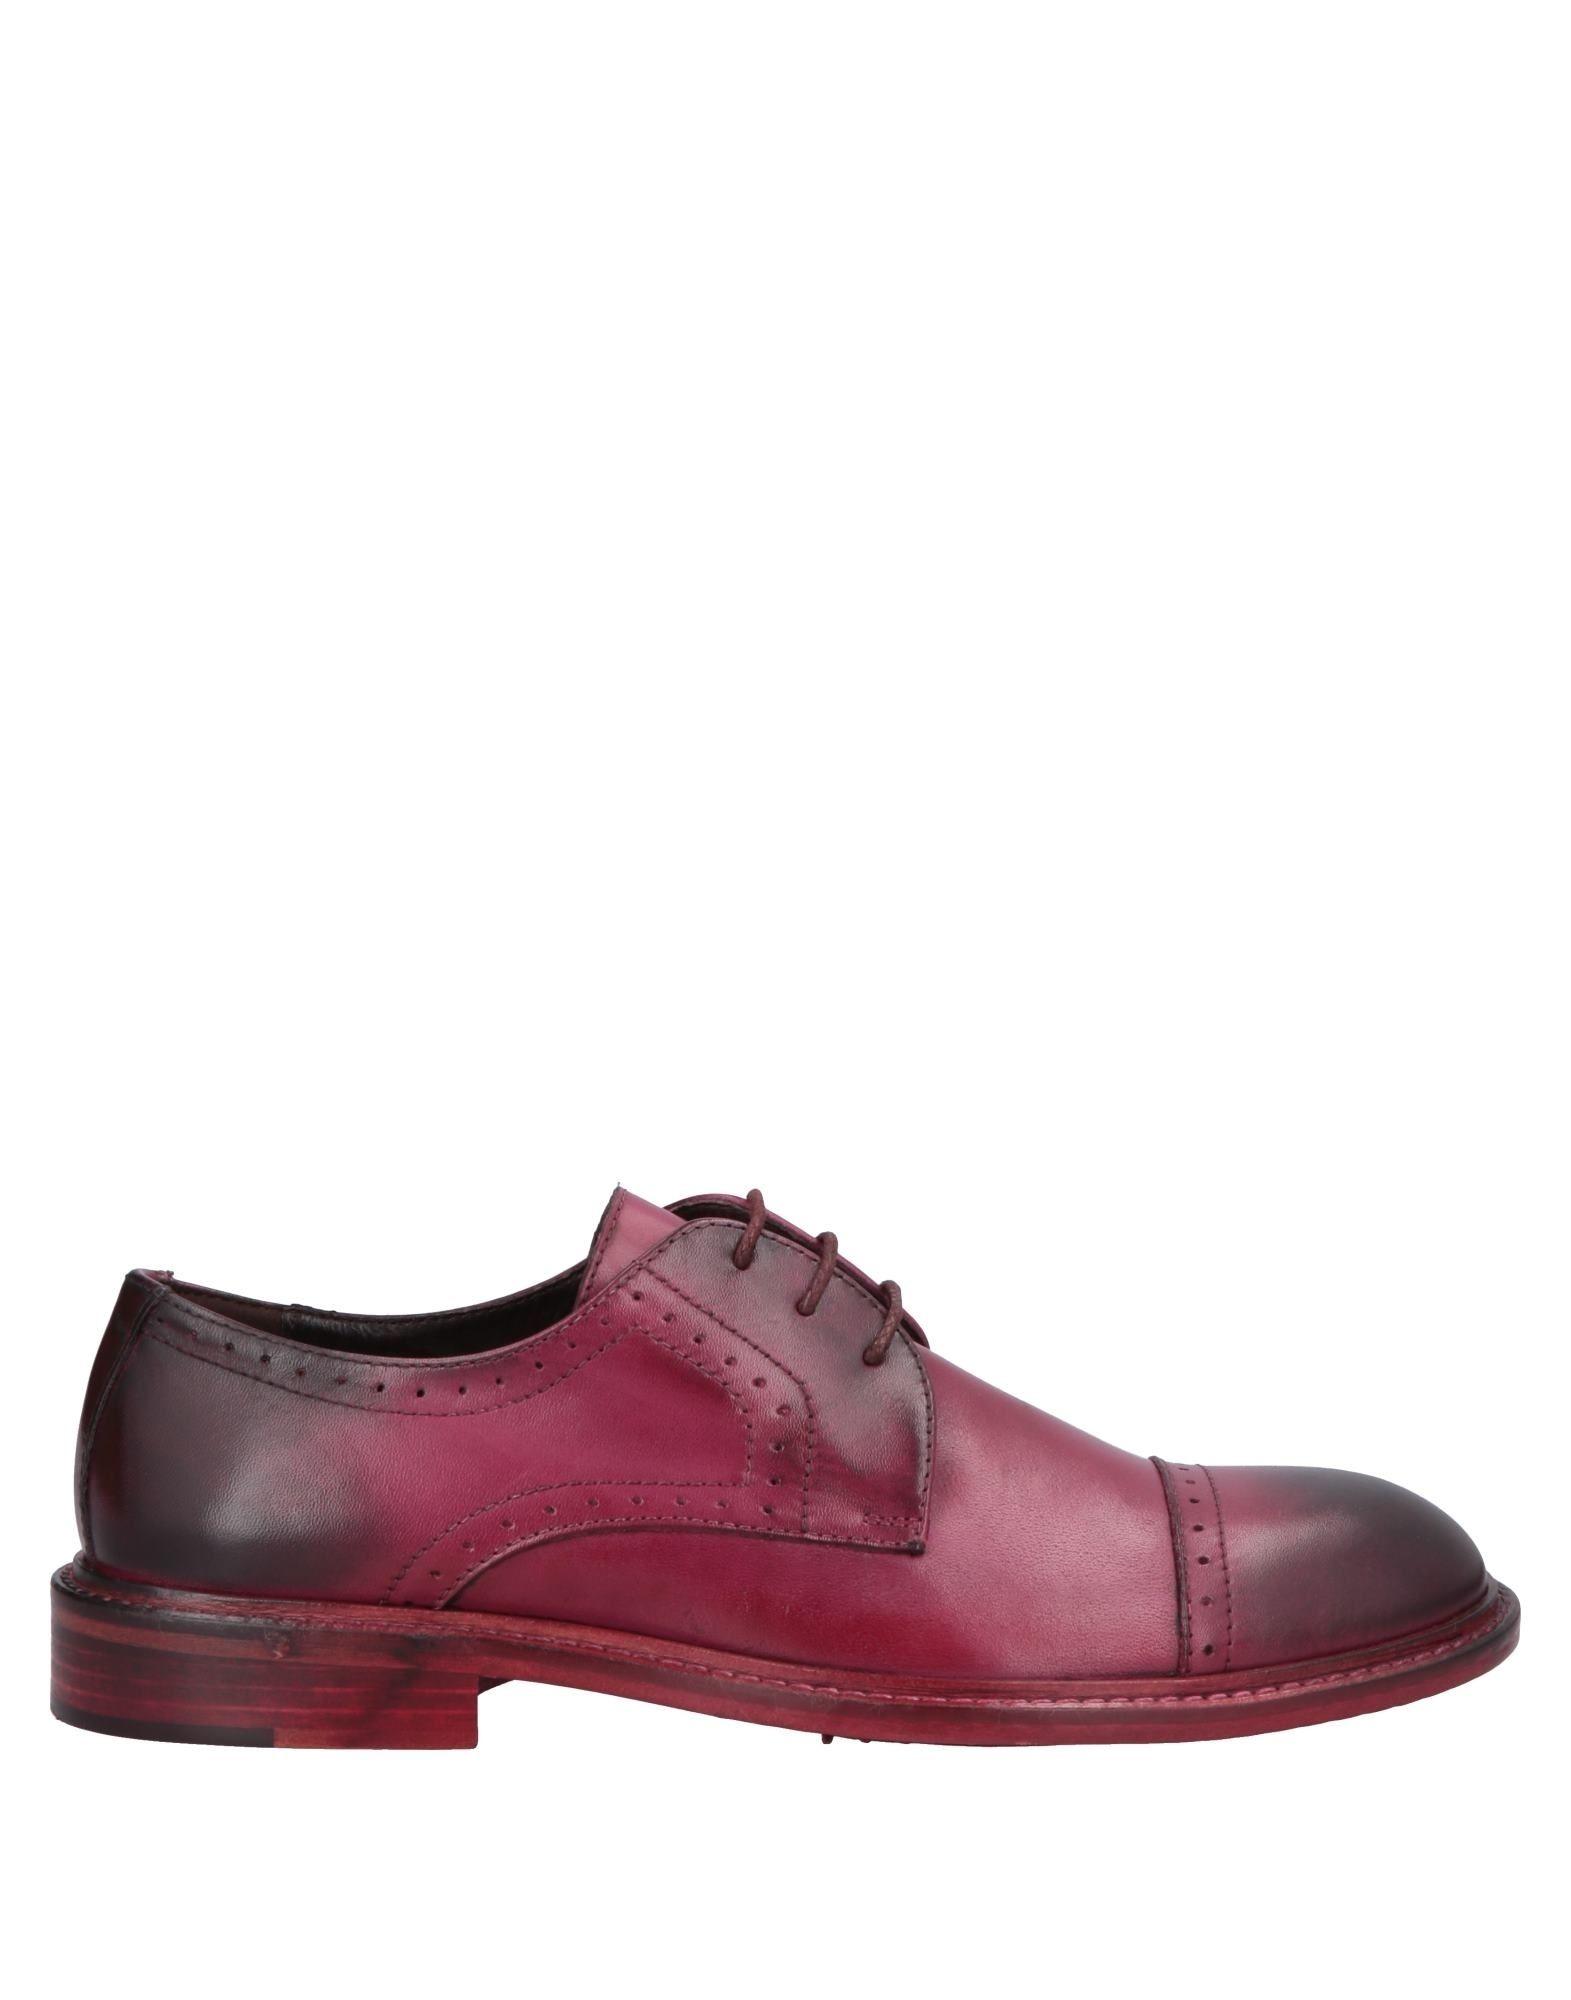 RICHARD LARS Обувь на шнурках обувь ламода